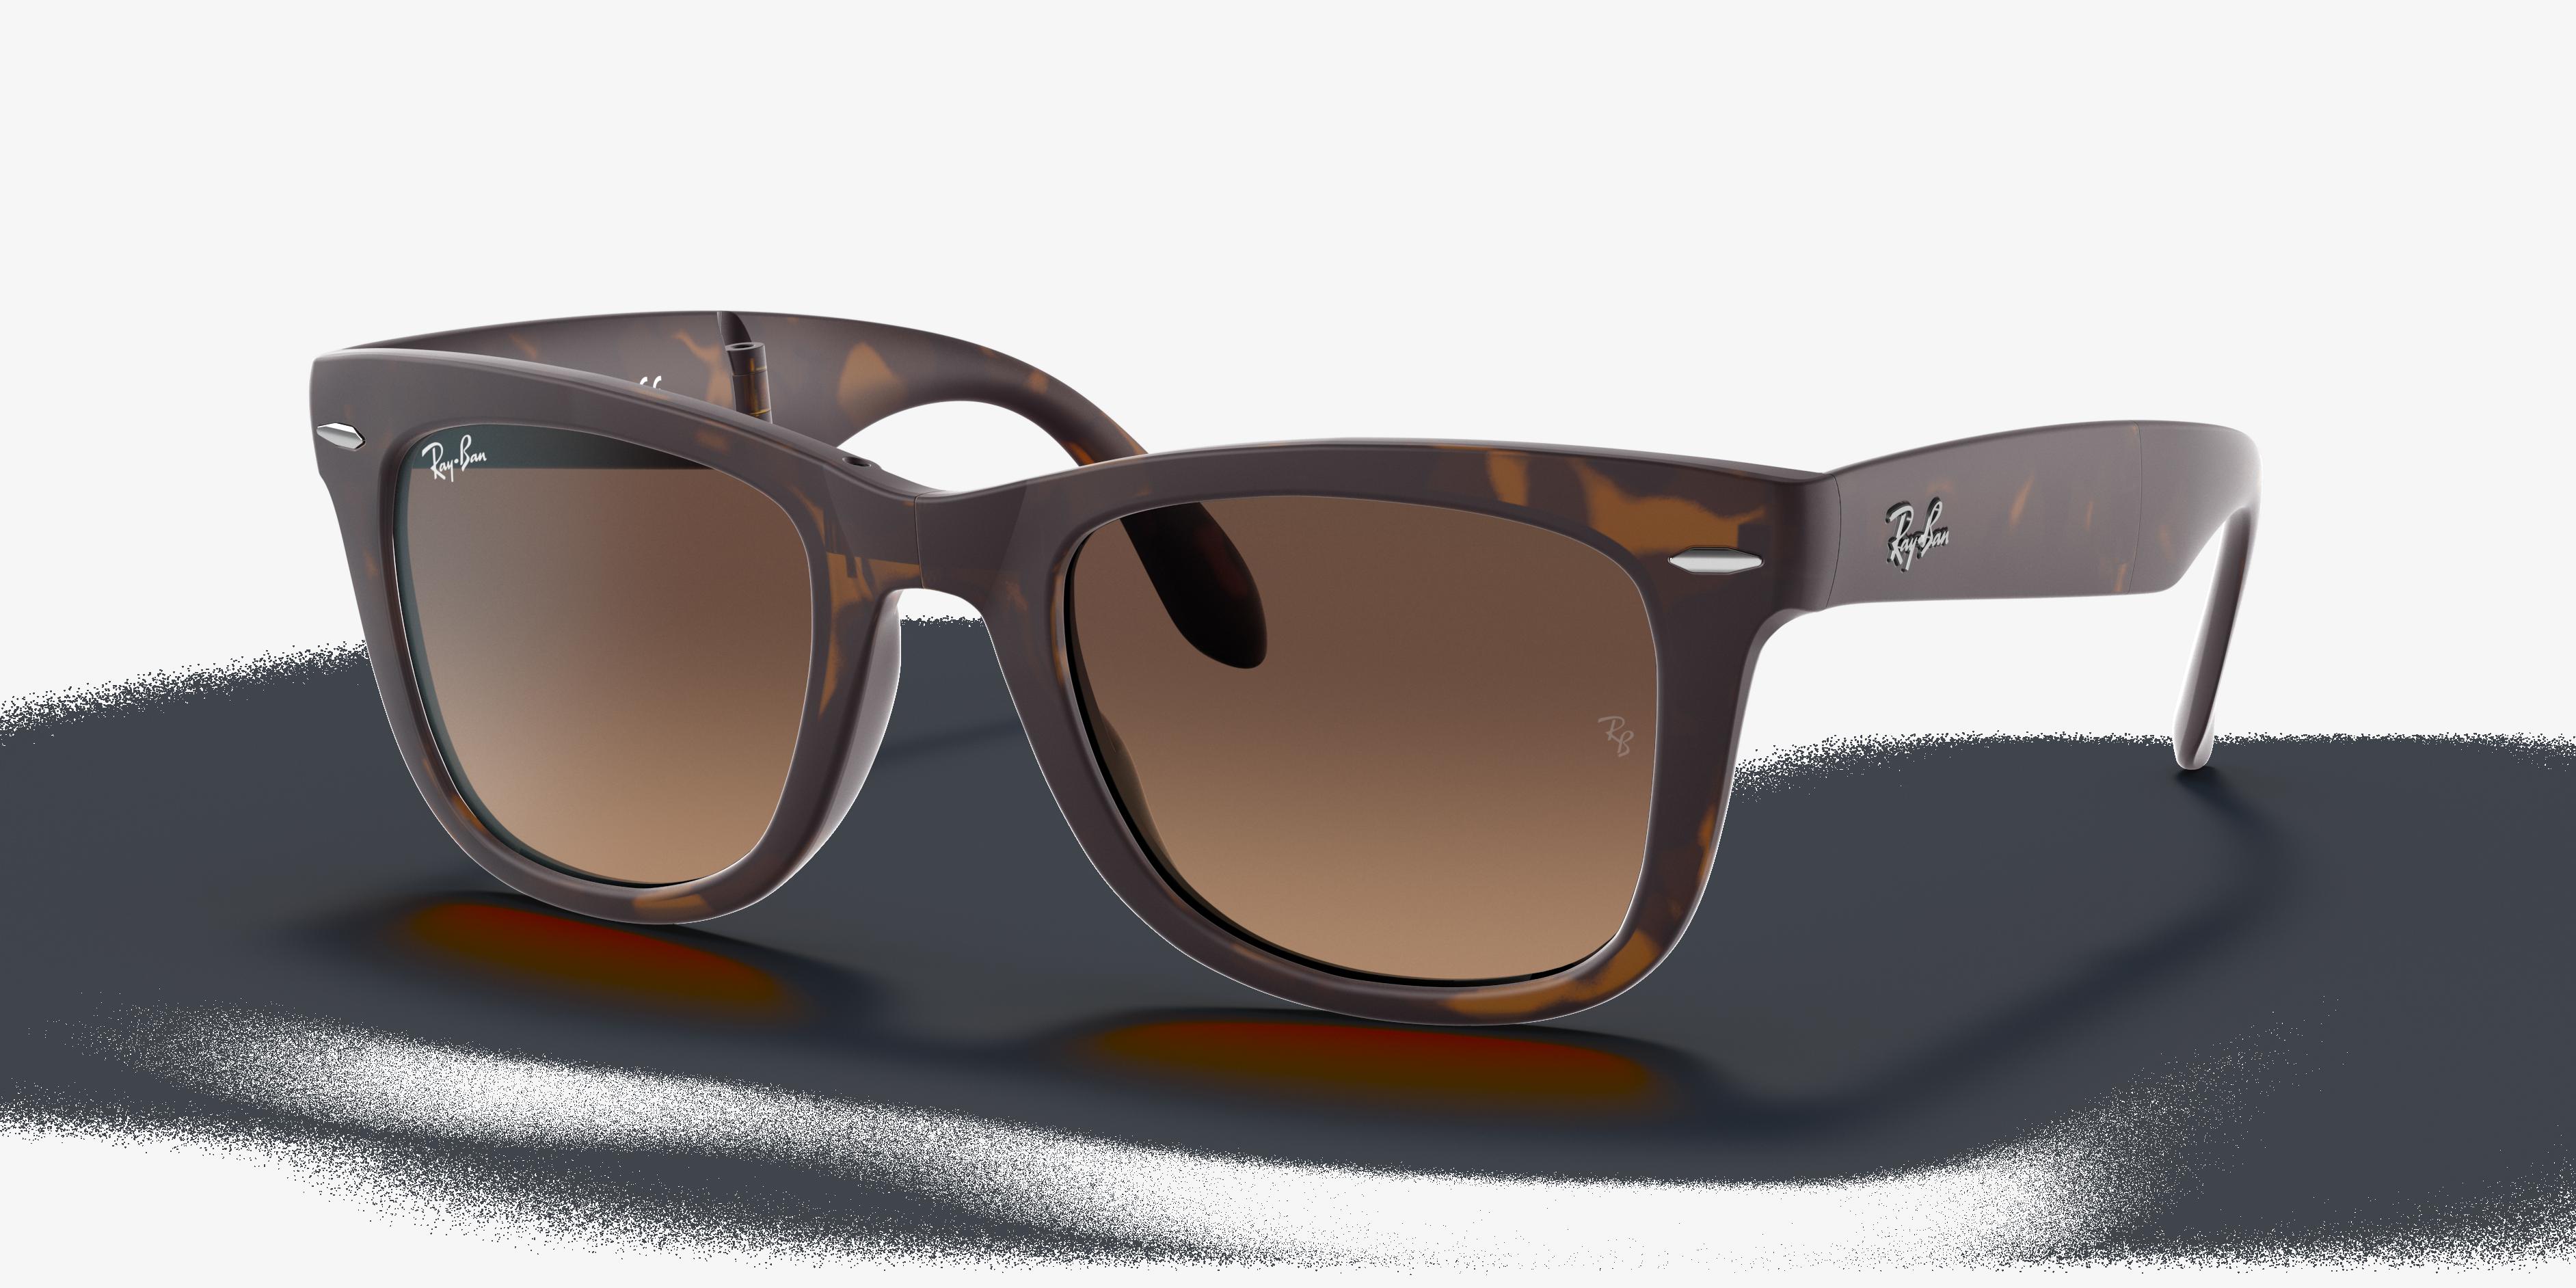 Ray-Ban Wayfarer Folding Gradient Tortoise, Brown Lenses - RB4105